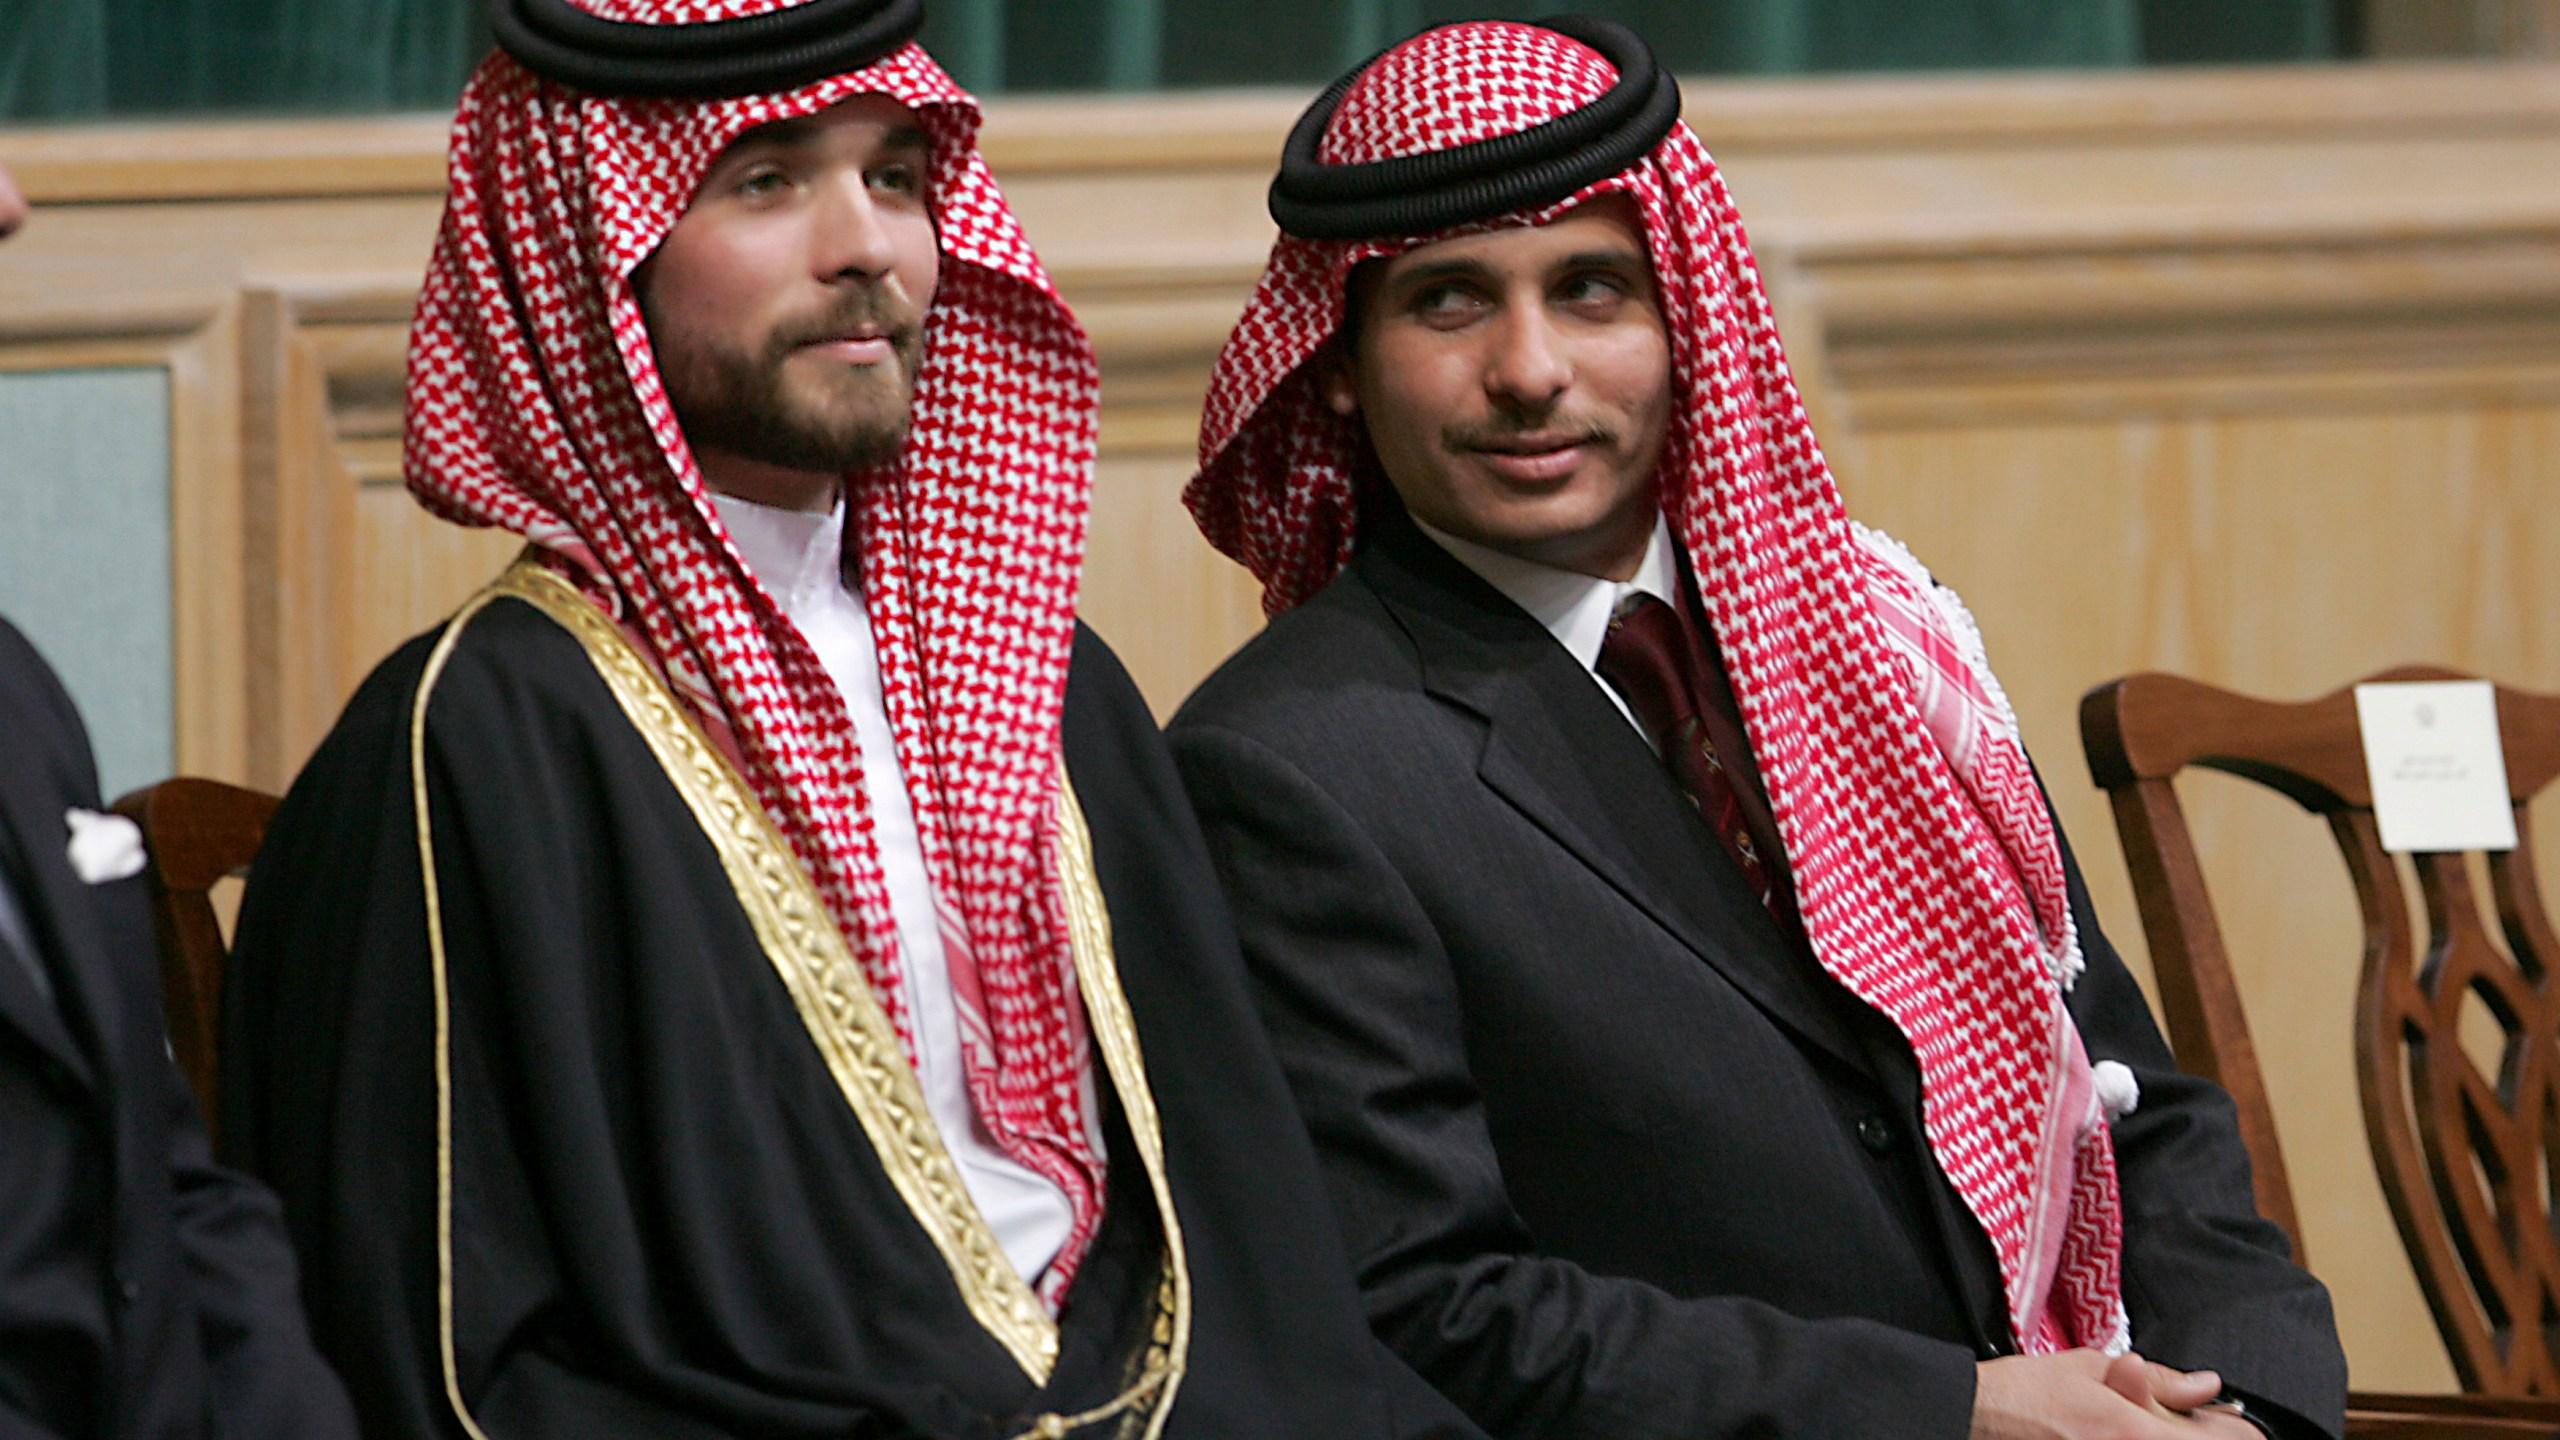 Prince Hamza Bin Al-Hussein, Prince Hashem Bin Al-Hussein,